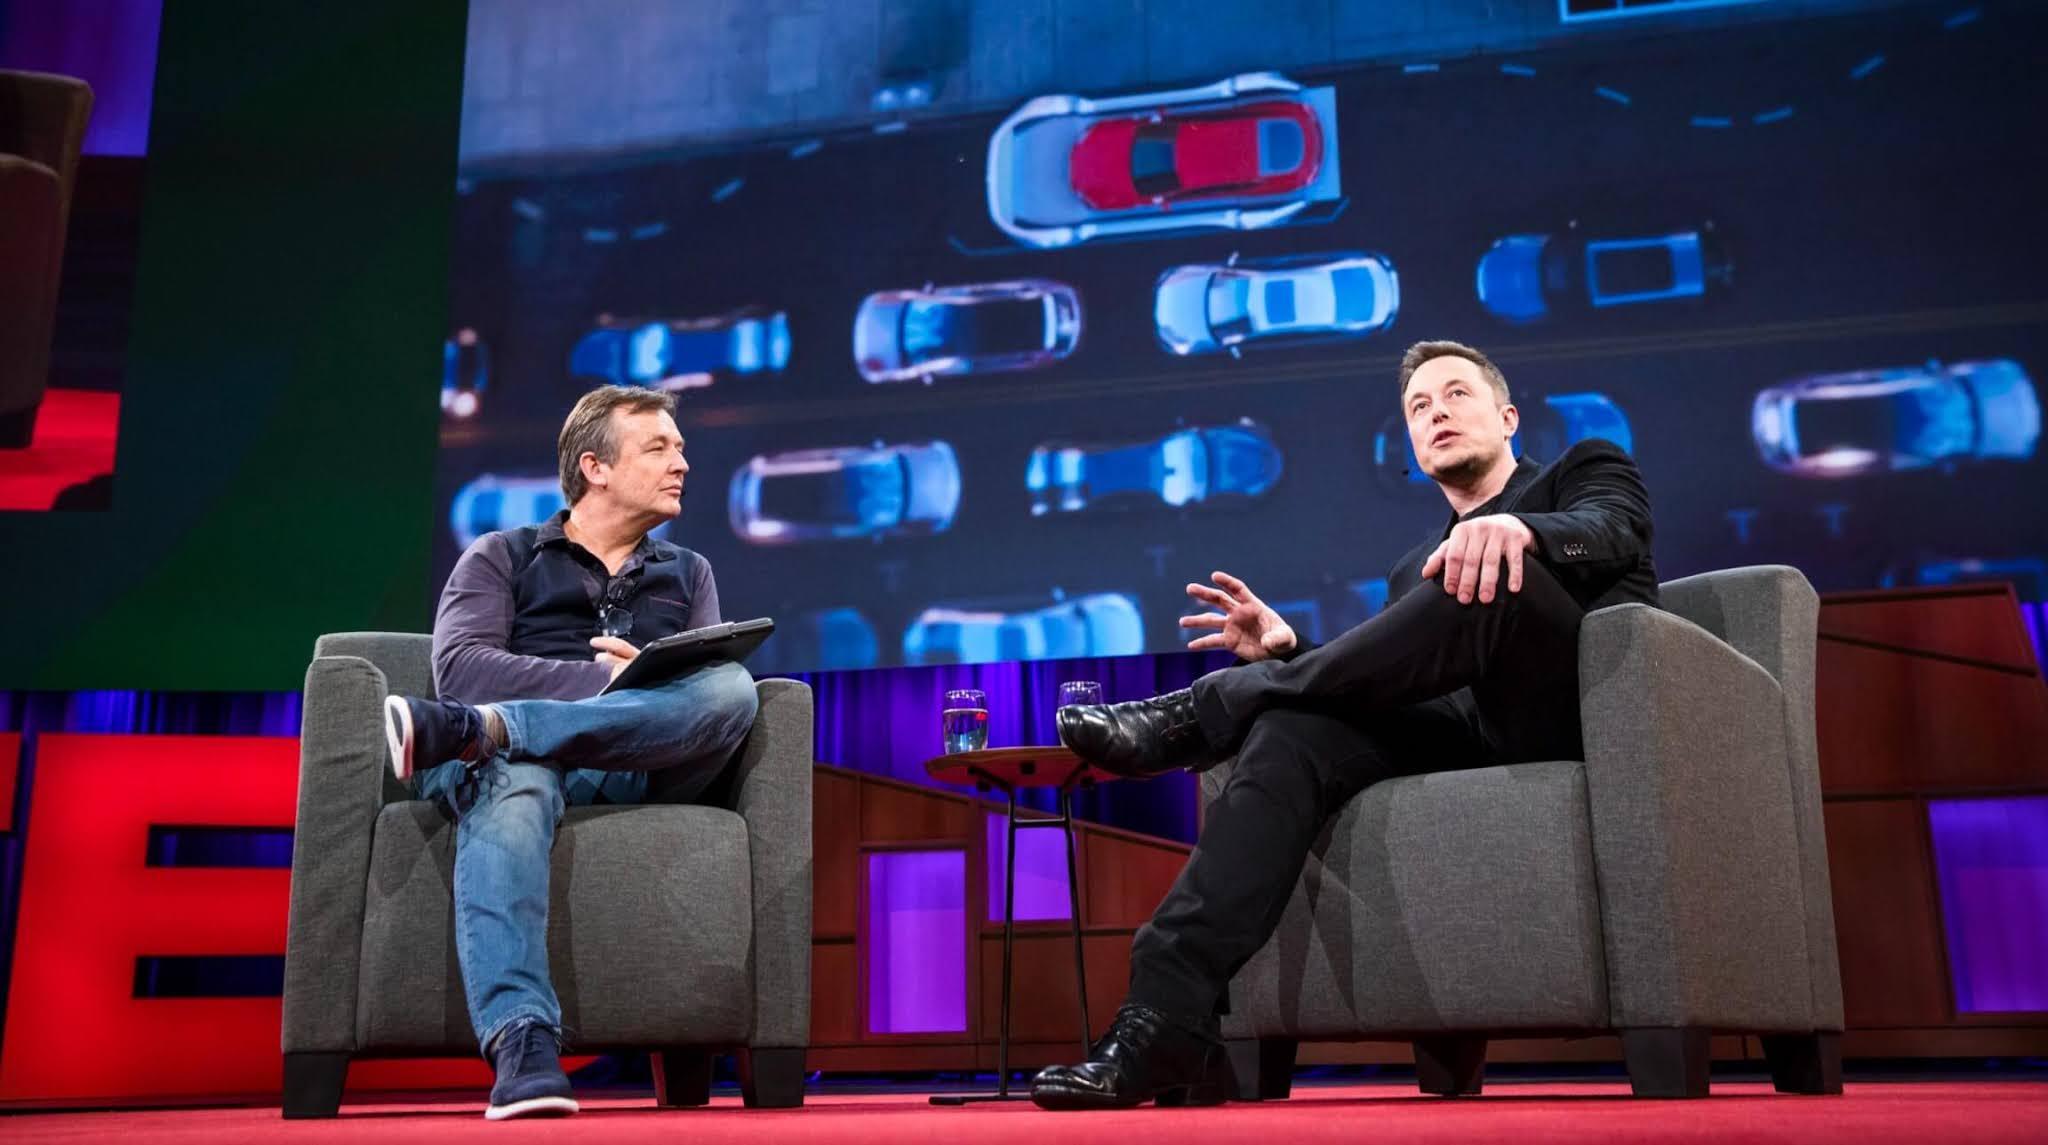 Elon Musk charlando